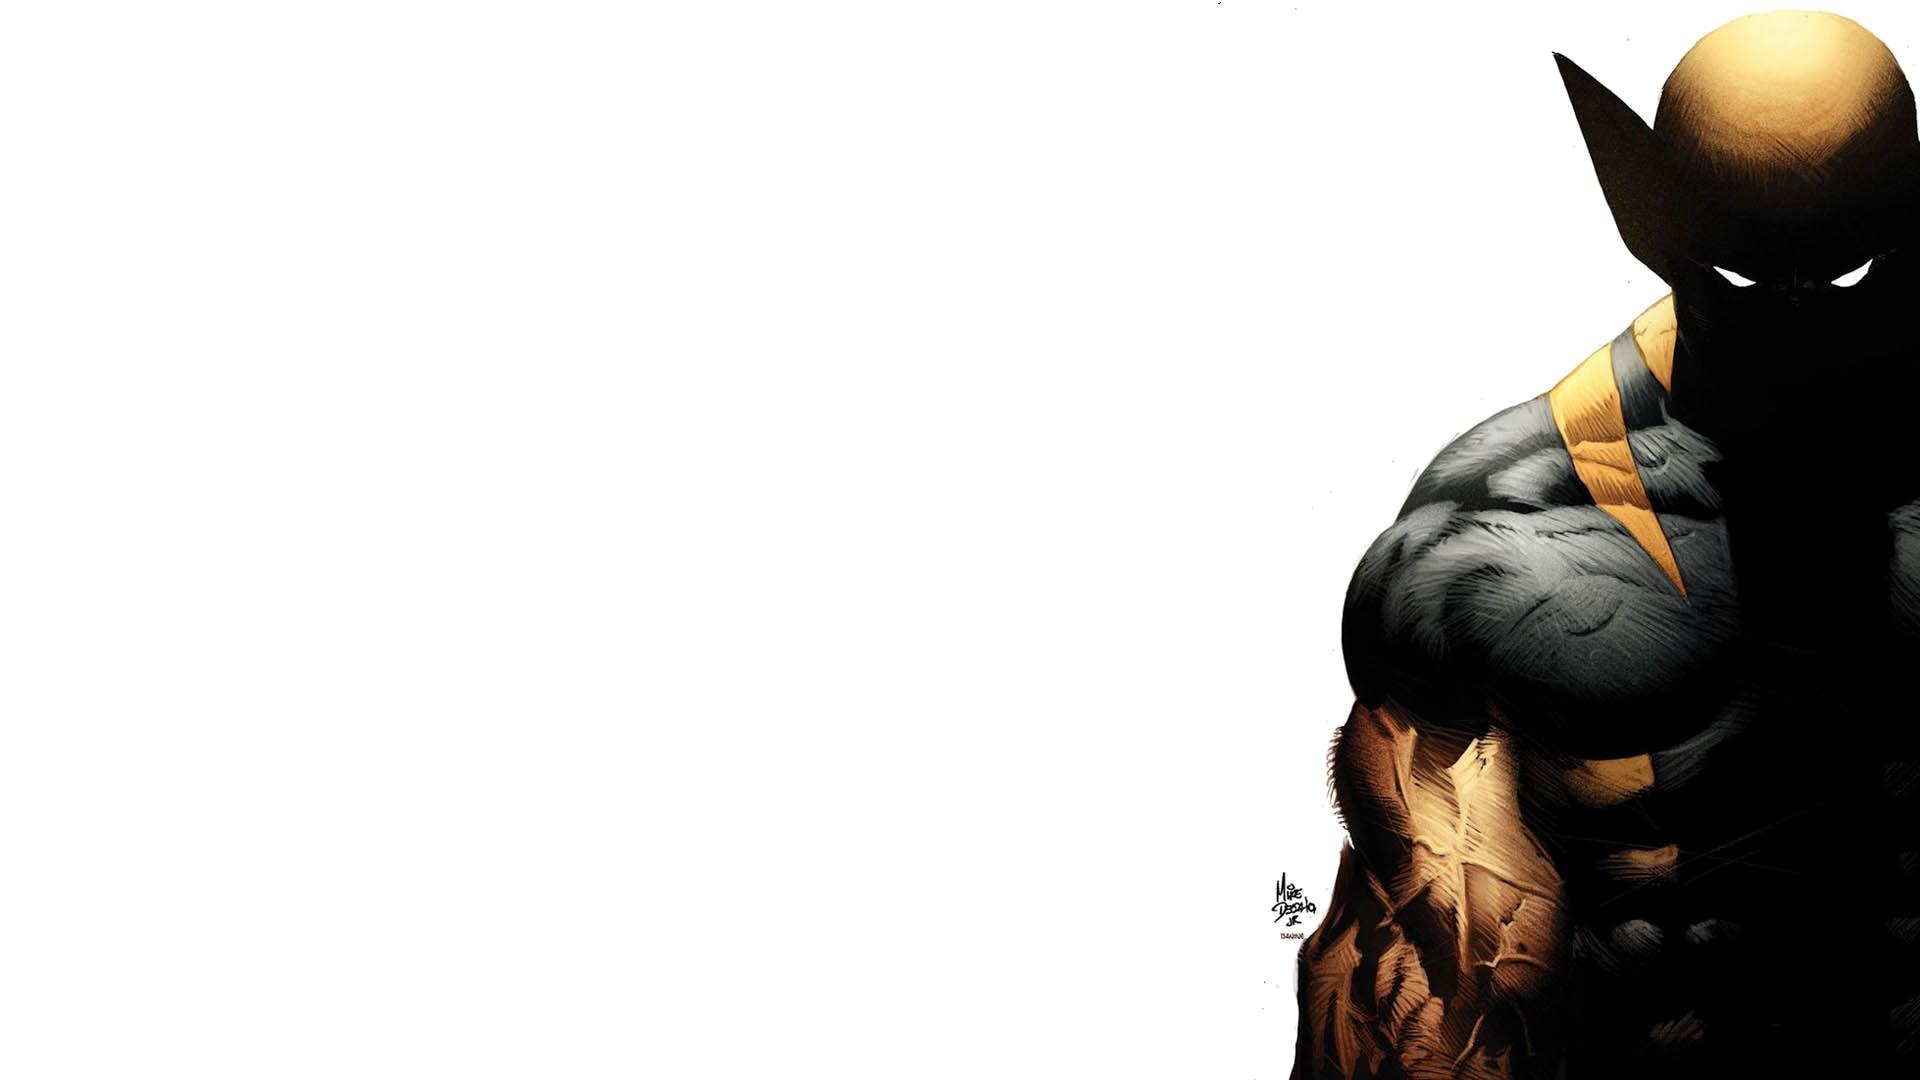 Res: 1920x1080, Wolverine Wallpaper